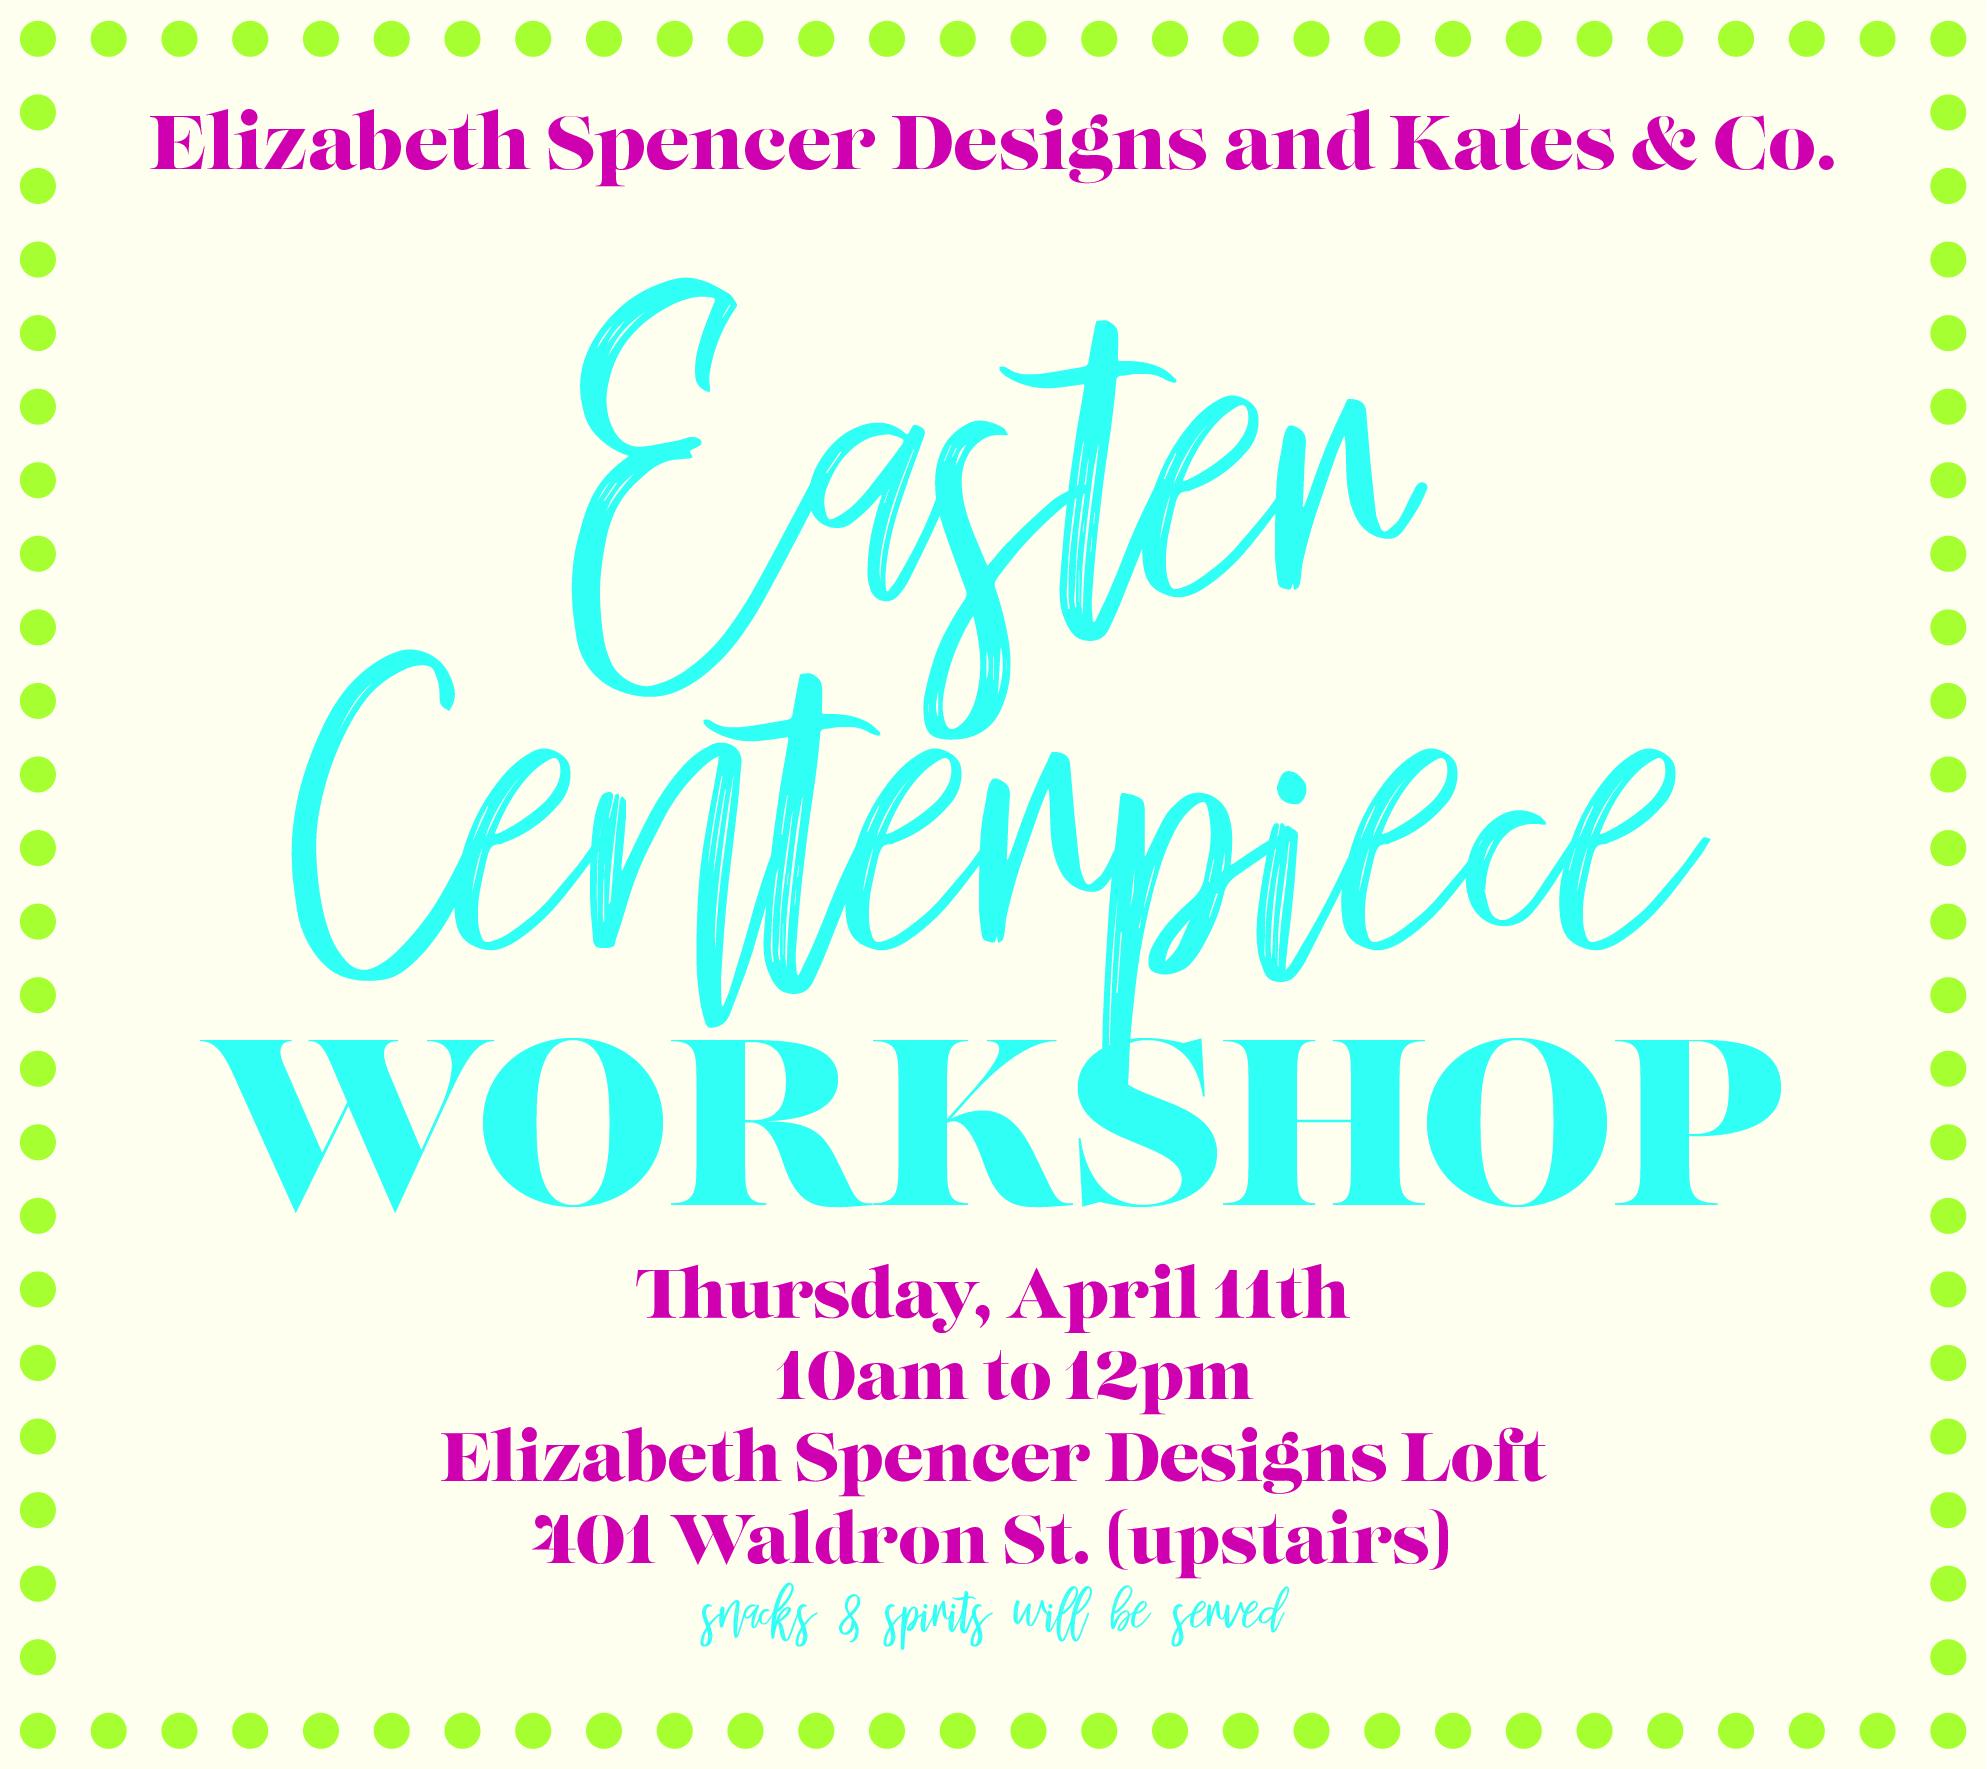 Easter Workshop@4x-100.jpg